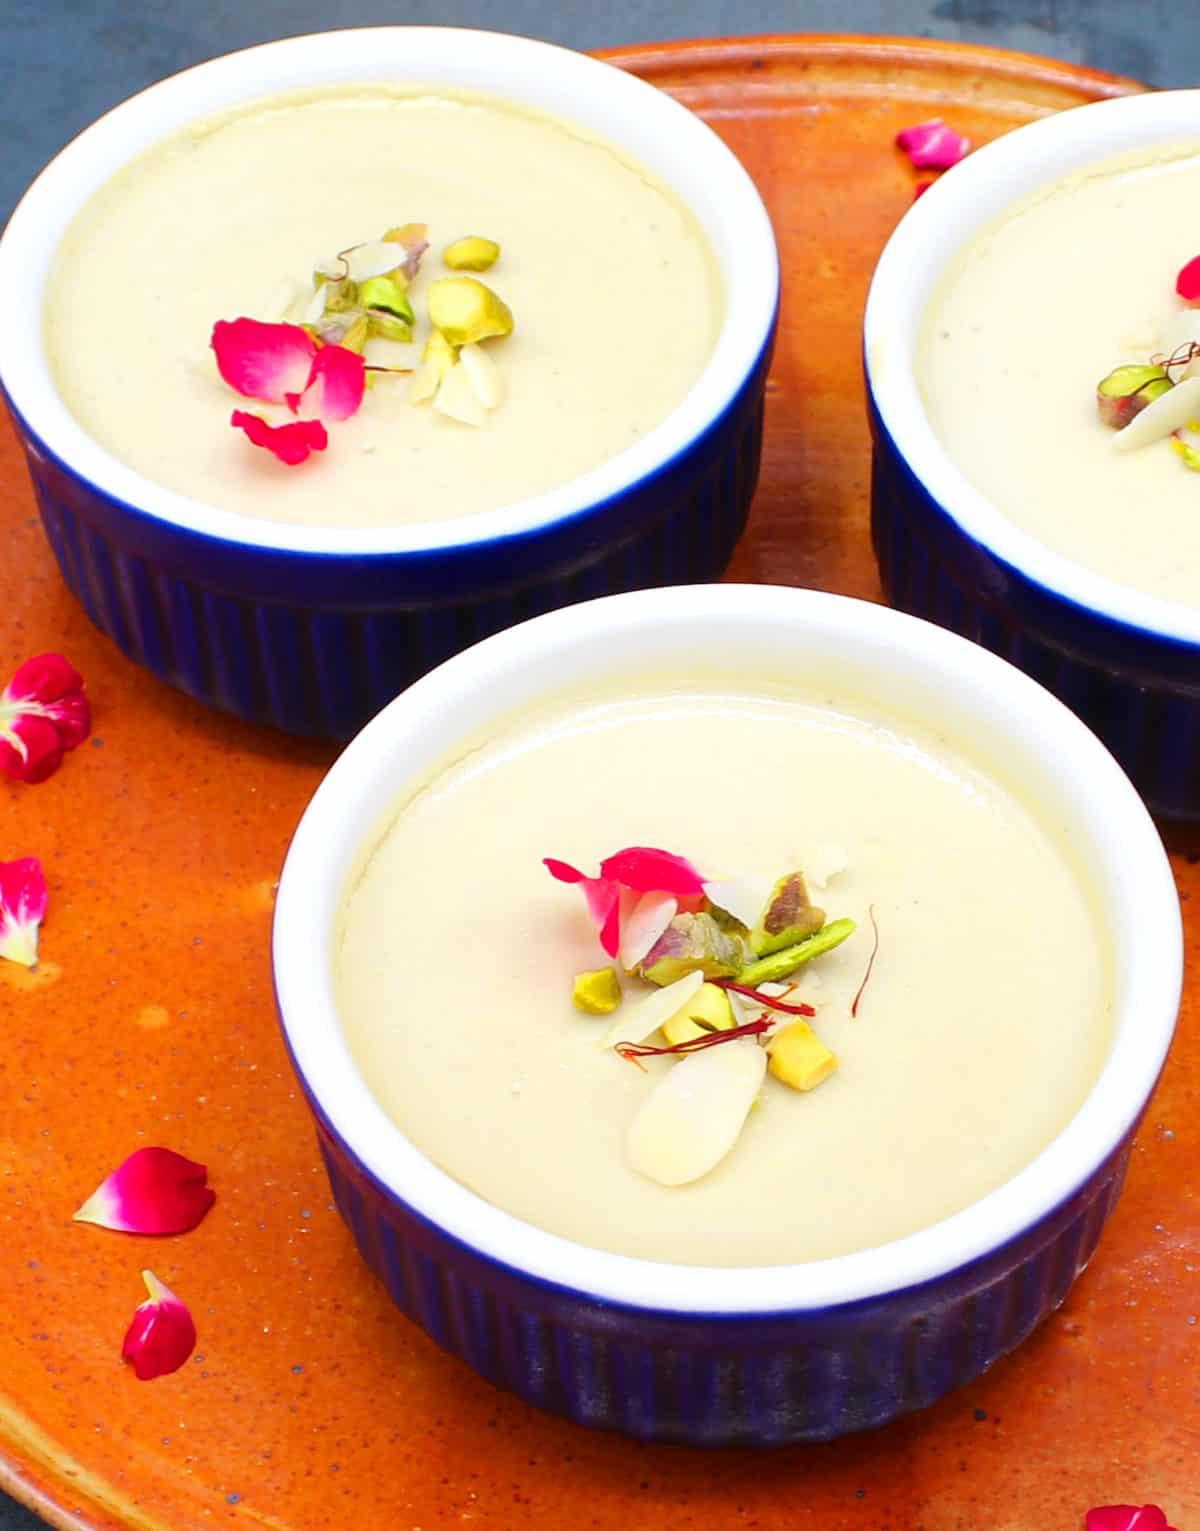 Front photo of ramekins of vegan mishti doi decorated with rose petals, saffron and nuts.